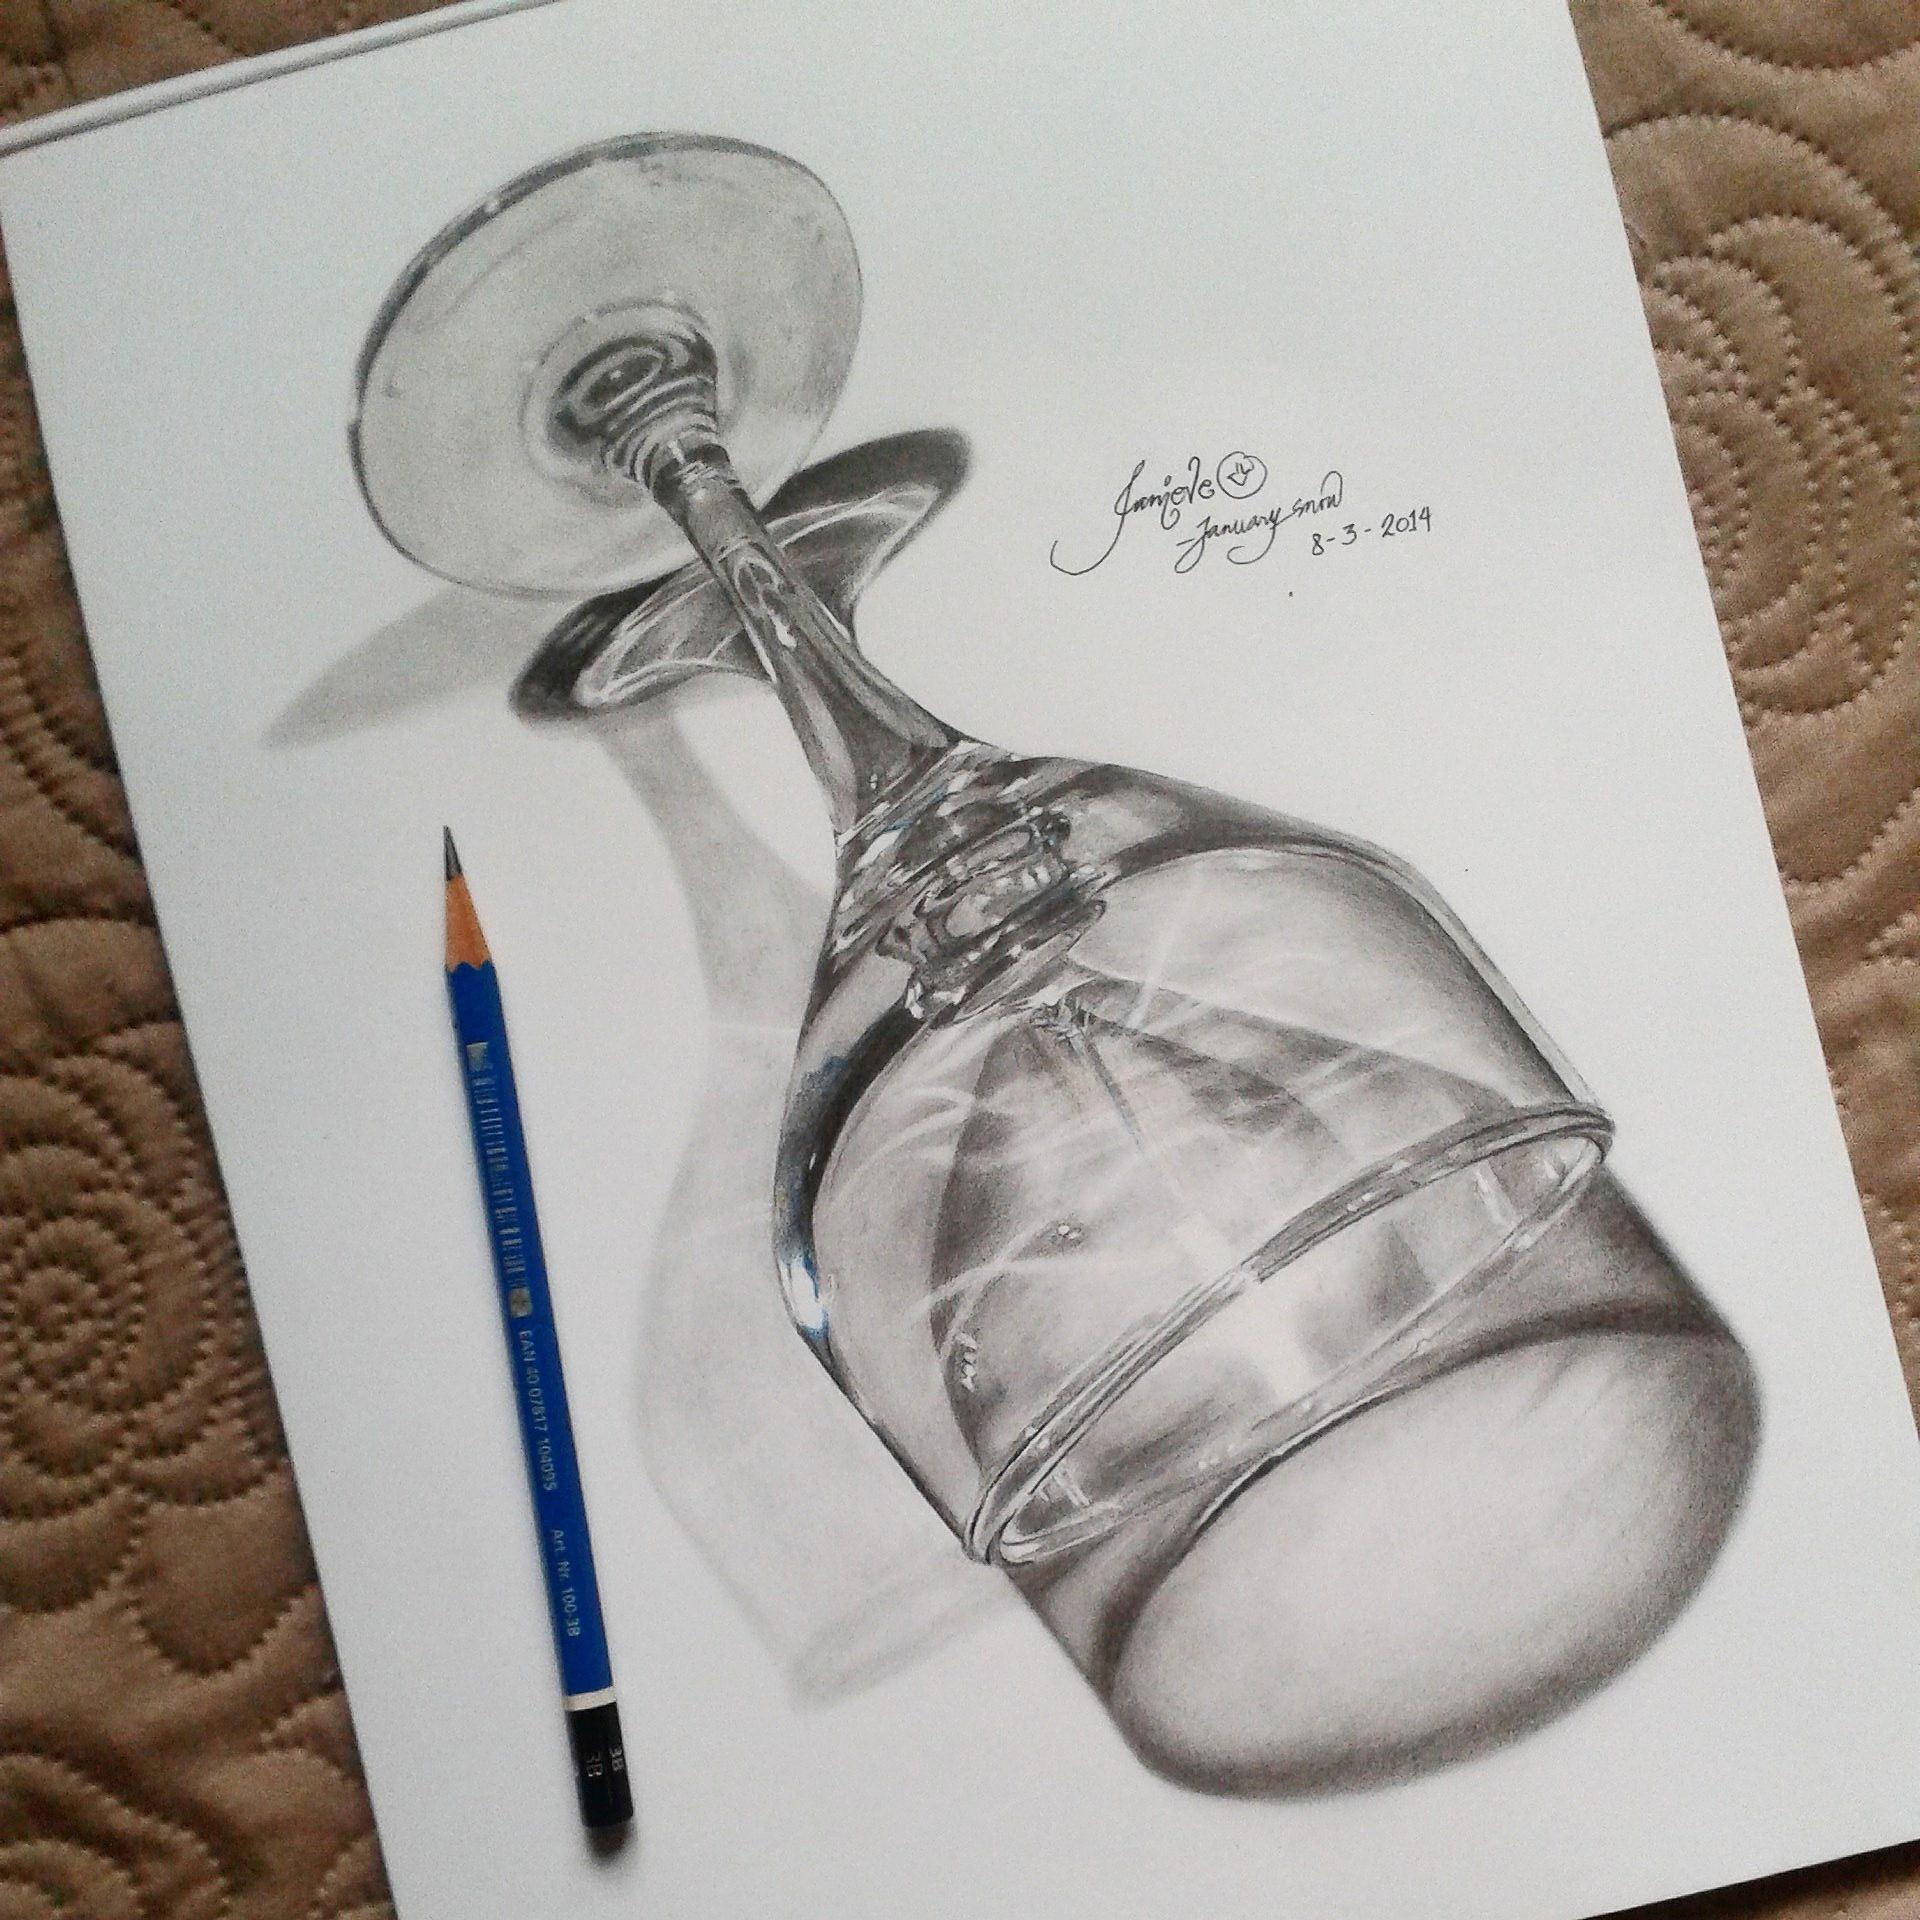 Drawn still life hyper realistic By Wine on by DeviantArt